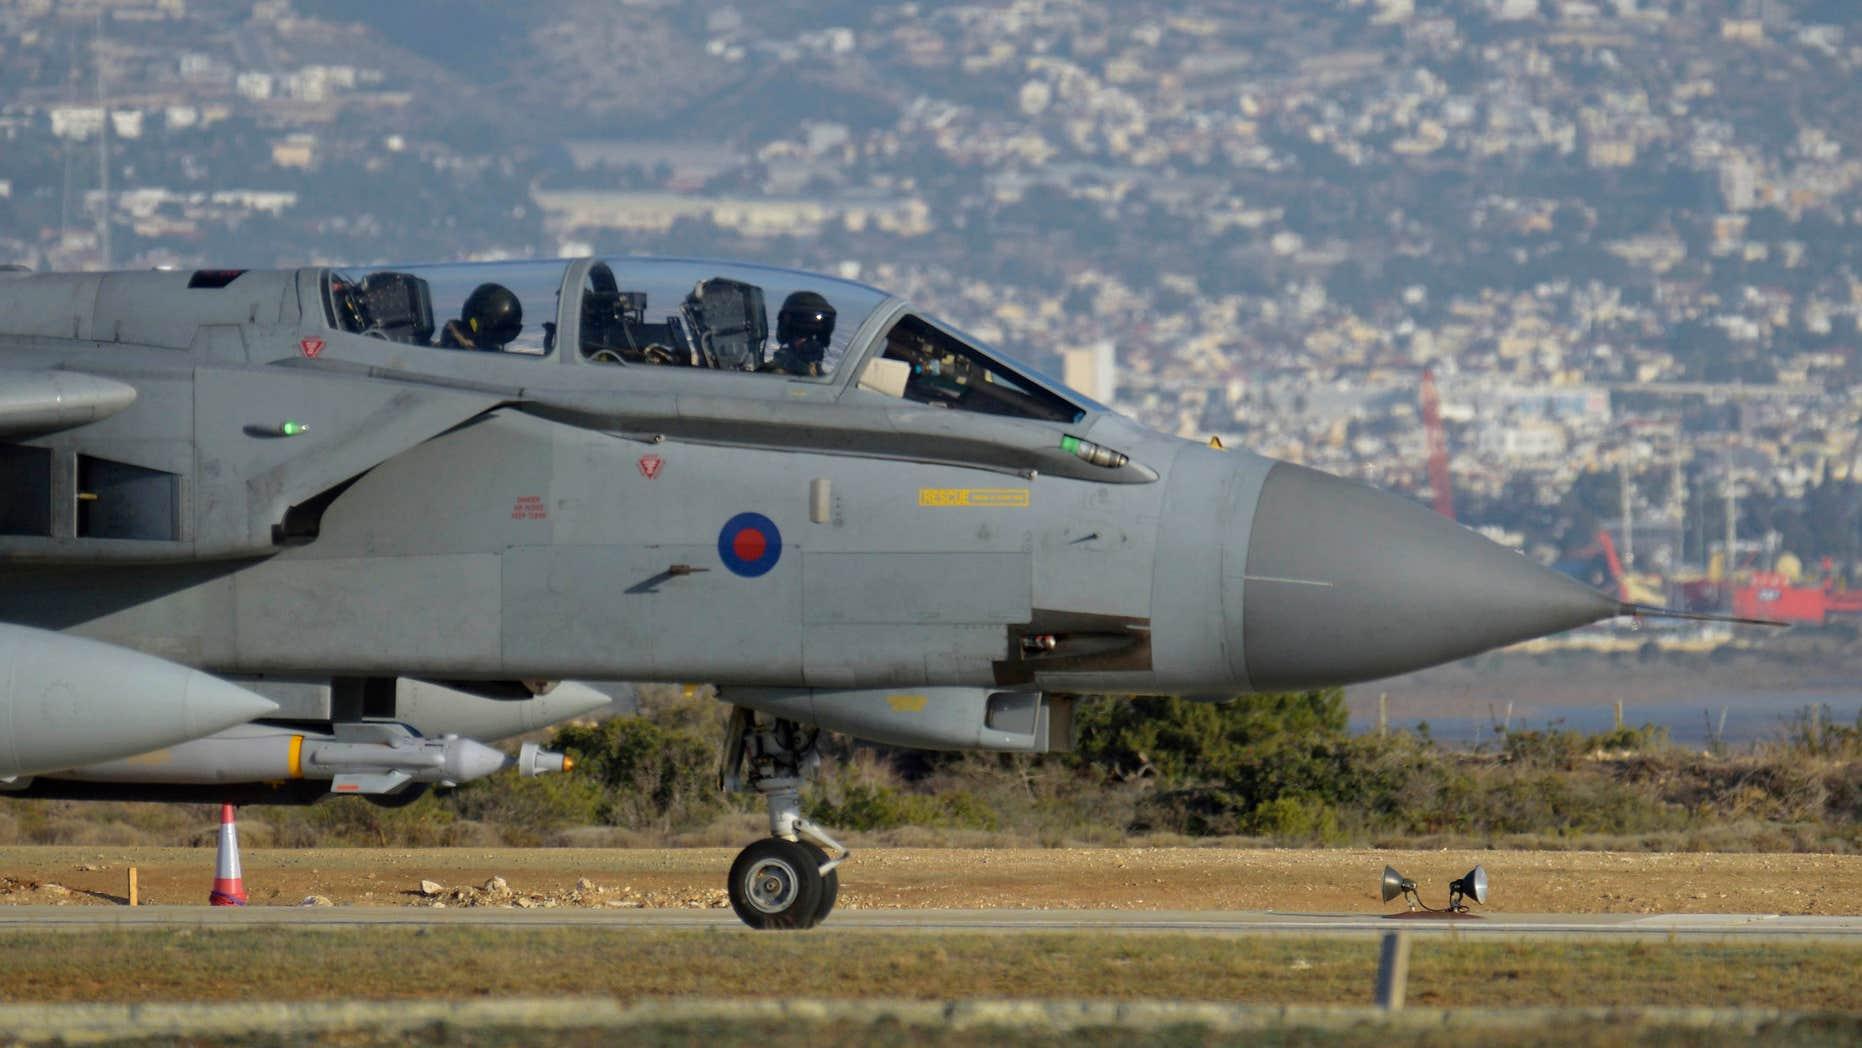 Dec. 3, 2015: A British tornado warplane passes on the runway at the RAF Akrotiri, a British air base near costal city of Limassol, Cyprus after an airstrike.